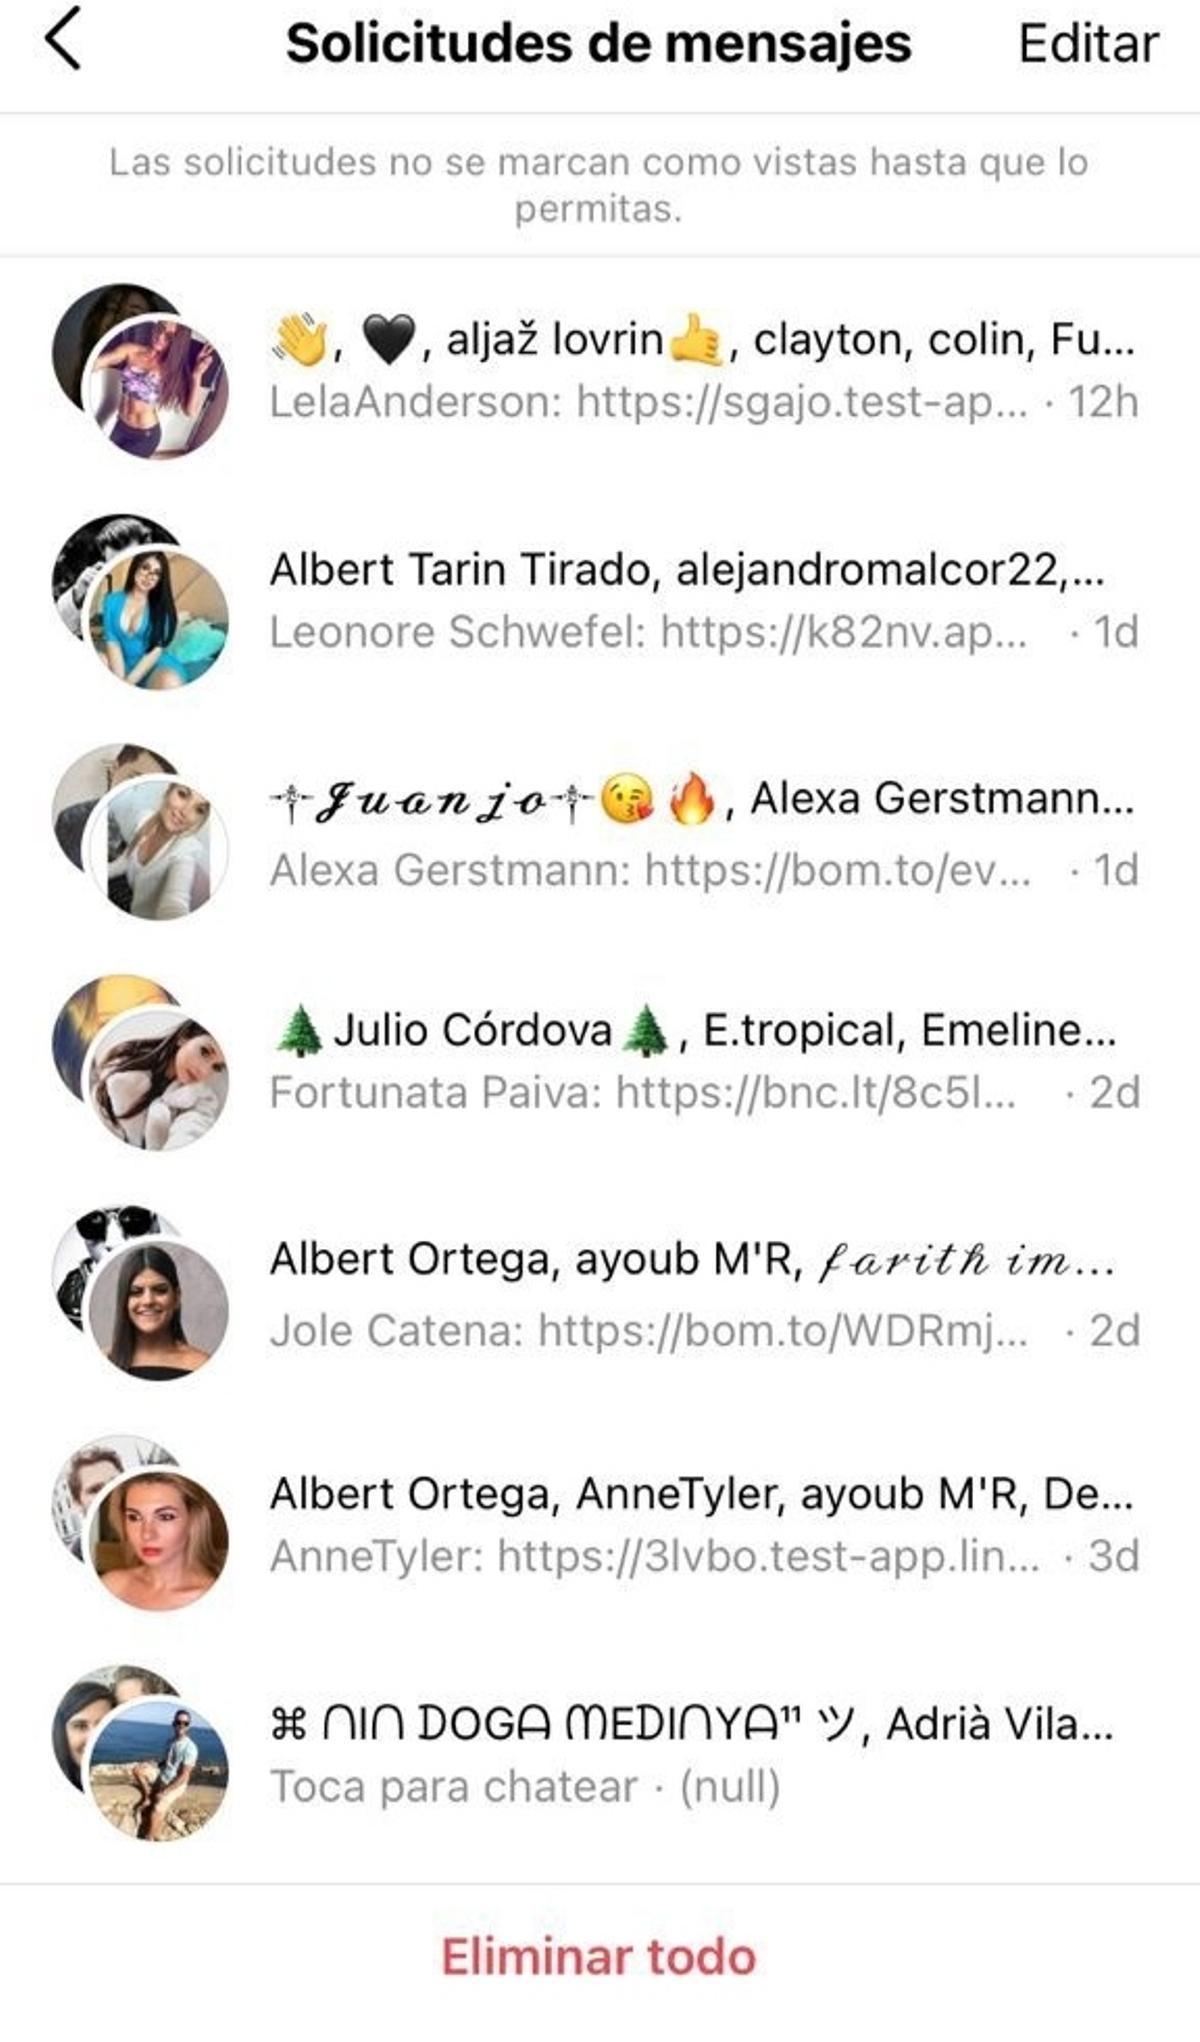 Captura de pantalla de mensajes de perfiles falsos en instagram